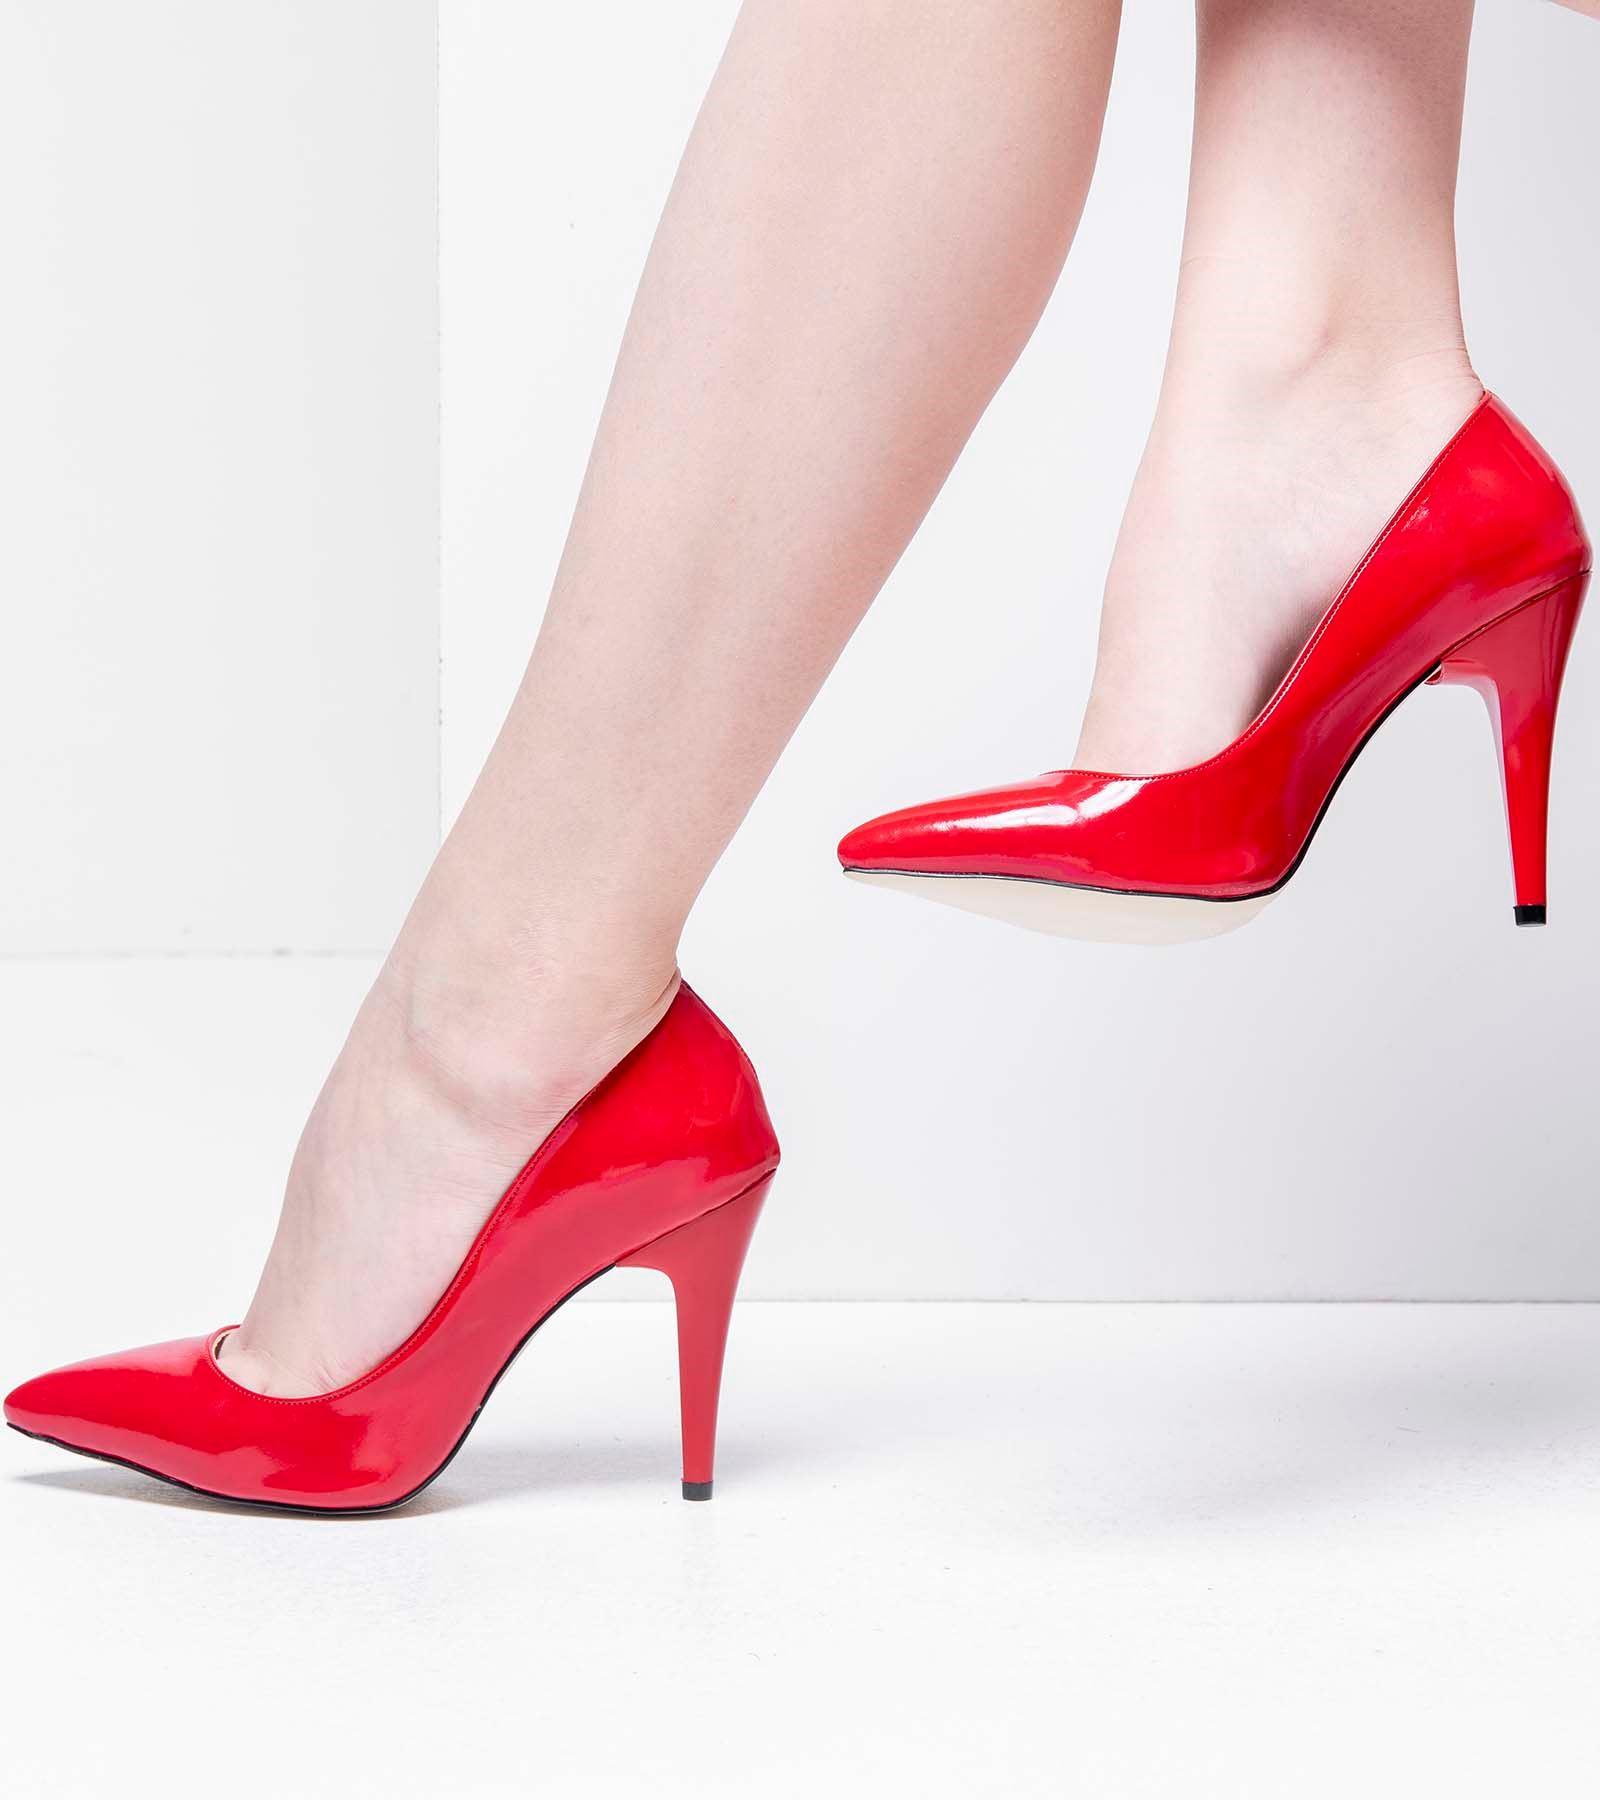 Candy İnce Topuk Rugan Stiletto Kırmızı